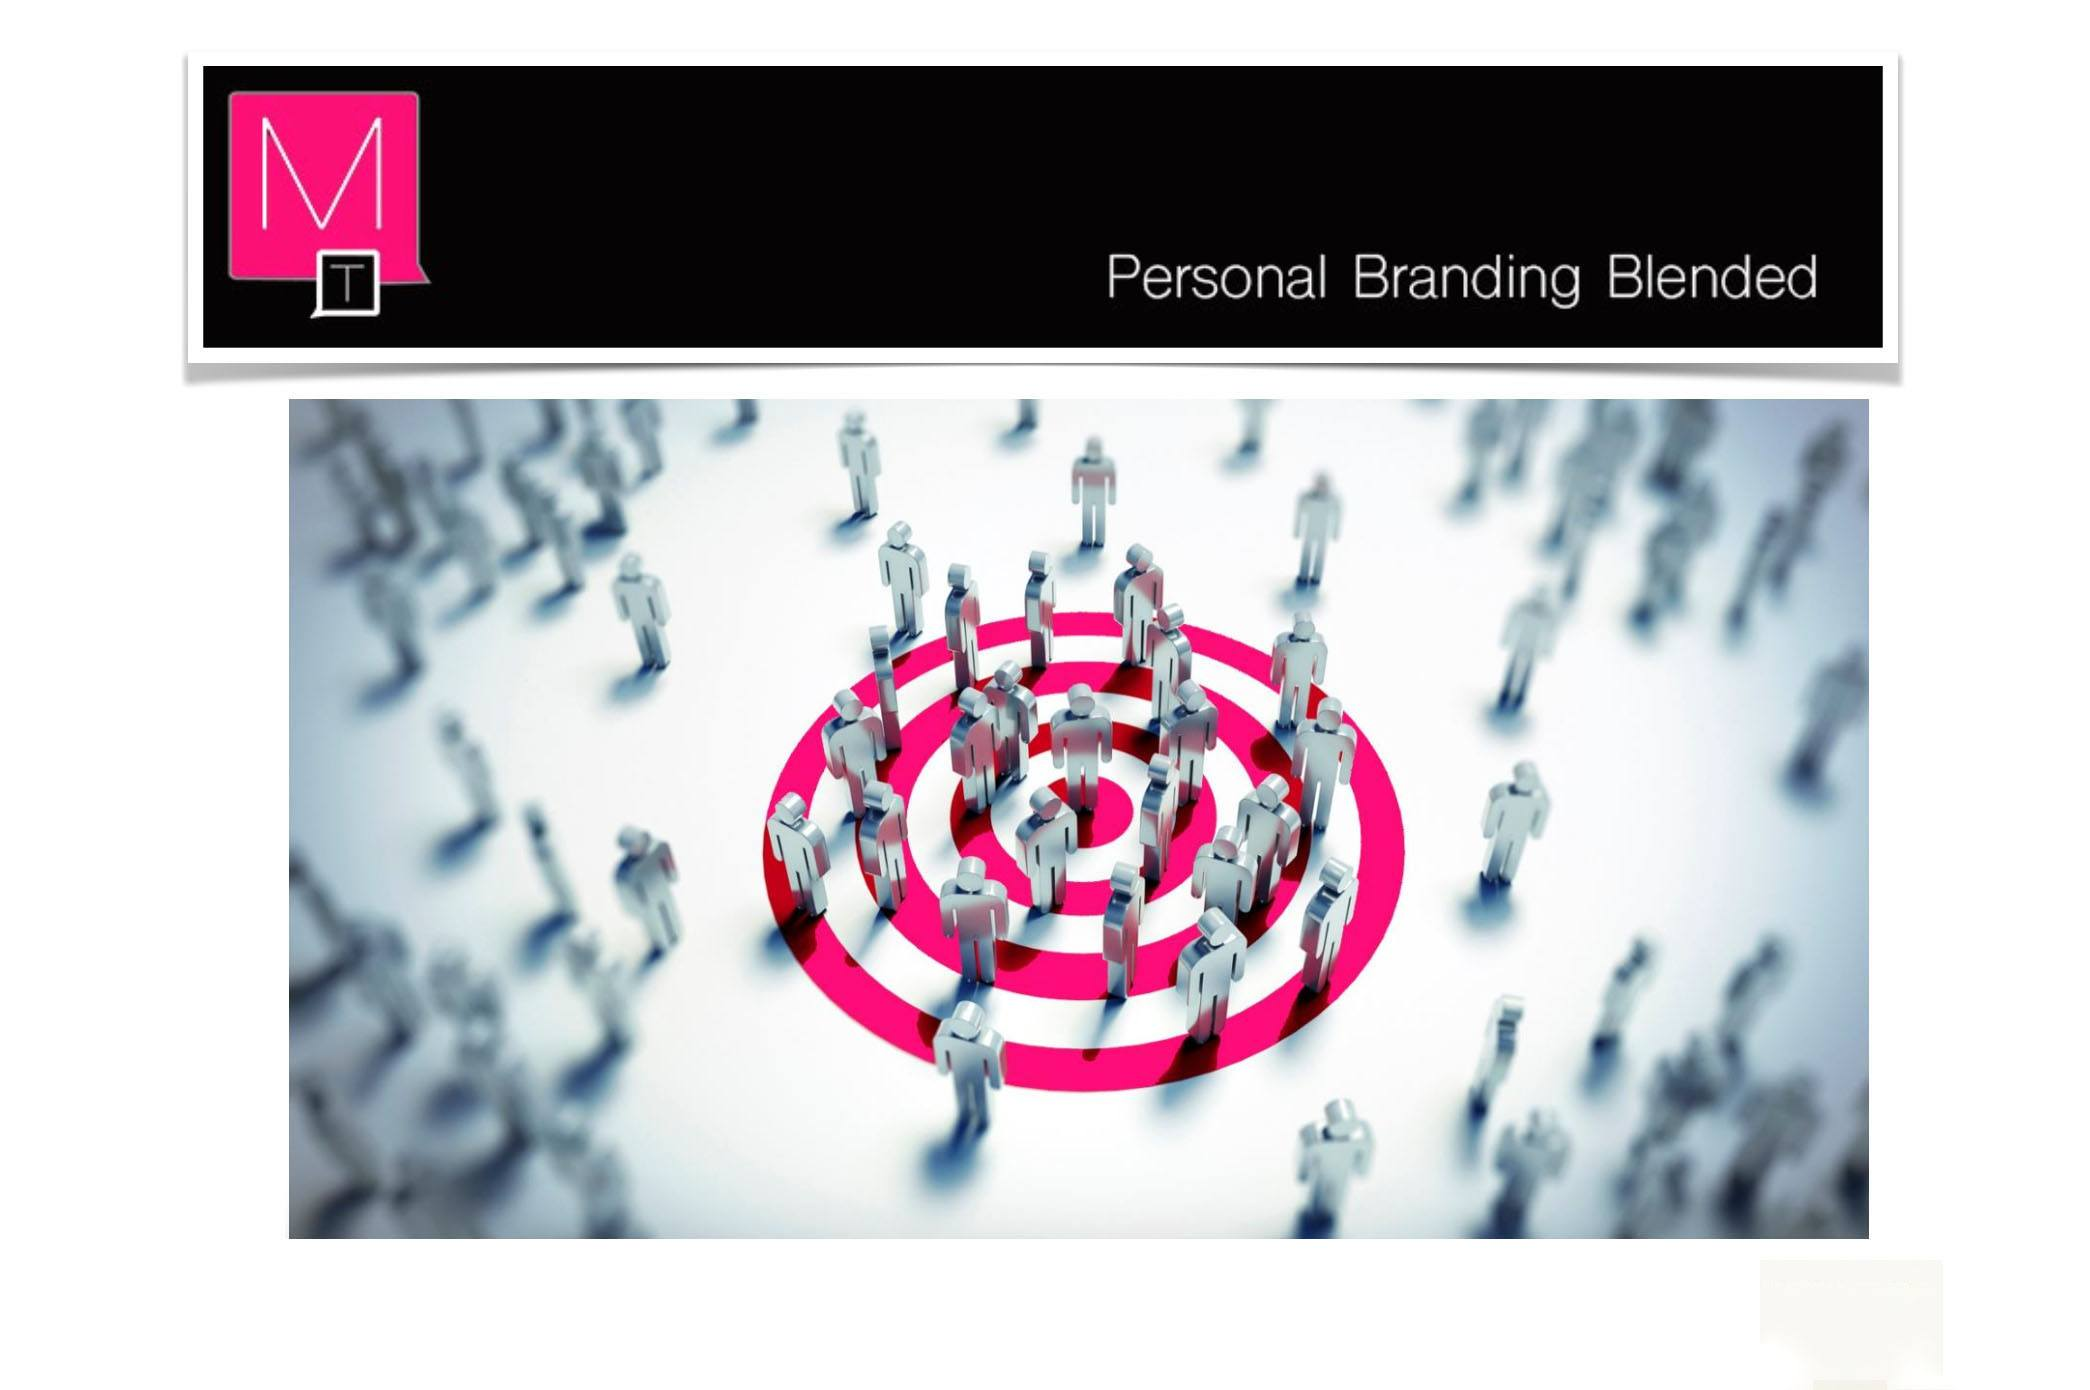 Target Group Personal Branding Blended